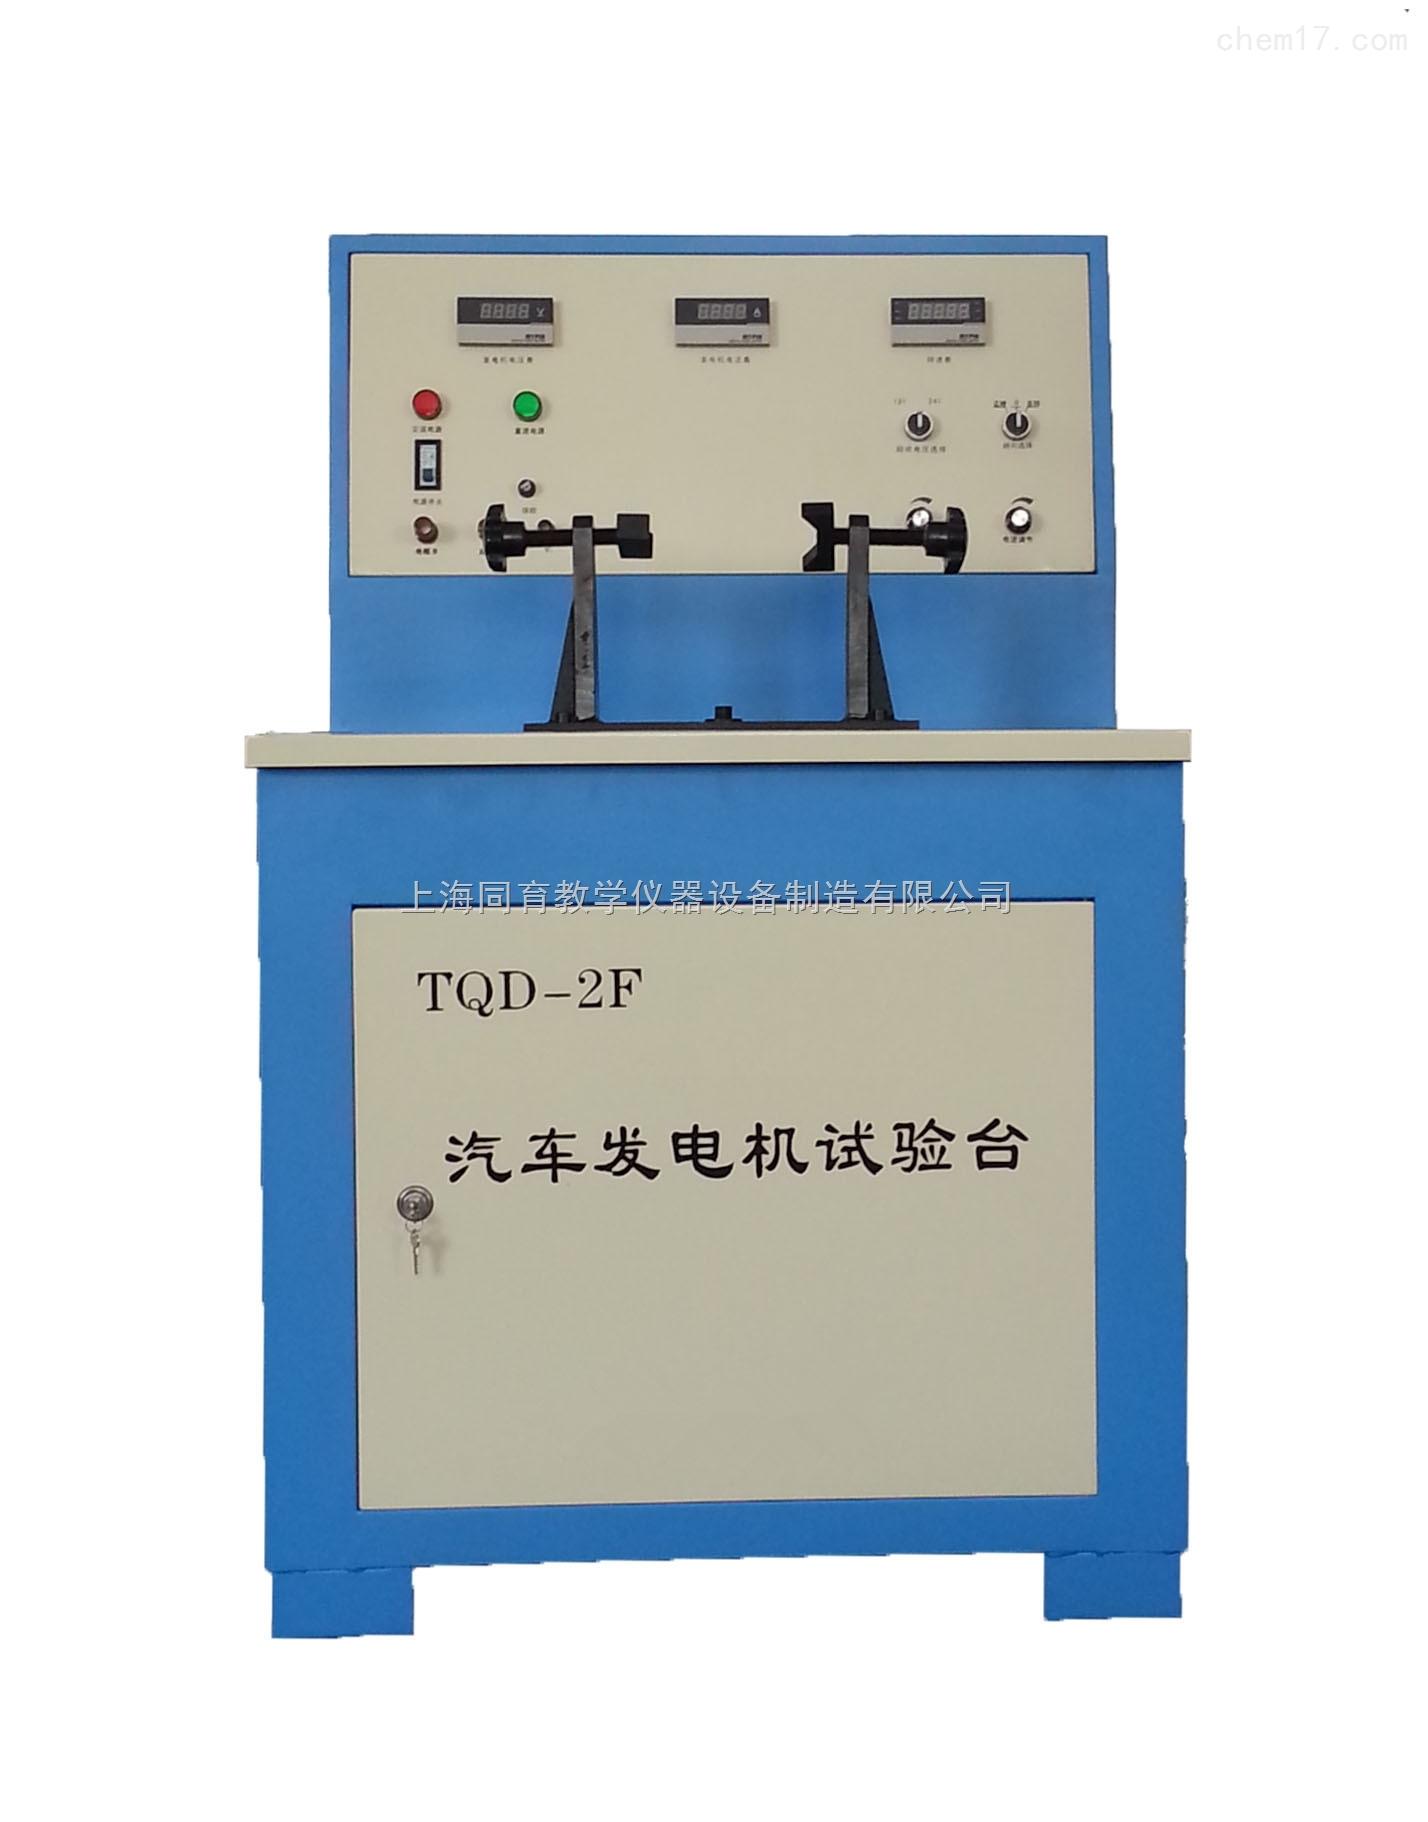 TQD-2F 汽车发电机试验台|汽车检测设备用于检验汽车直流发电机工作性能,测试发电机的电压、电流、及工作转速。采用数字变频器调节电机转速,带通智能数显仪表显示测试数据。负载测试采用电子调节。测试数据精确。发电机安装方式简便易操作。适合测试各种型号的车用发电机。 1、电源:(供本台使用) 交流:50Hz220V,单相 直流:12V、24V(蓄电池:厂家需自备蓄电池2块置于试验台内部) 2、变频调整范围: 转速调节范围(空载):0-2500r/min 转向:正、反转 3、发电机测试装置范围: 发电机功率在1